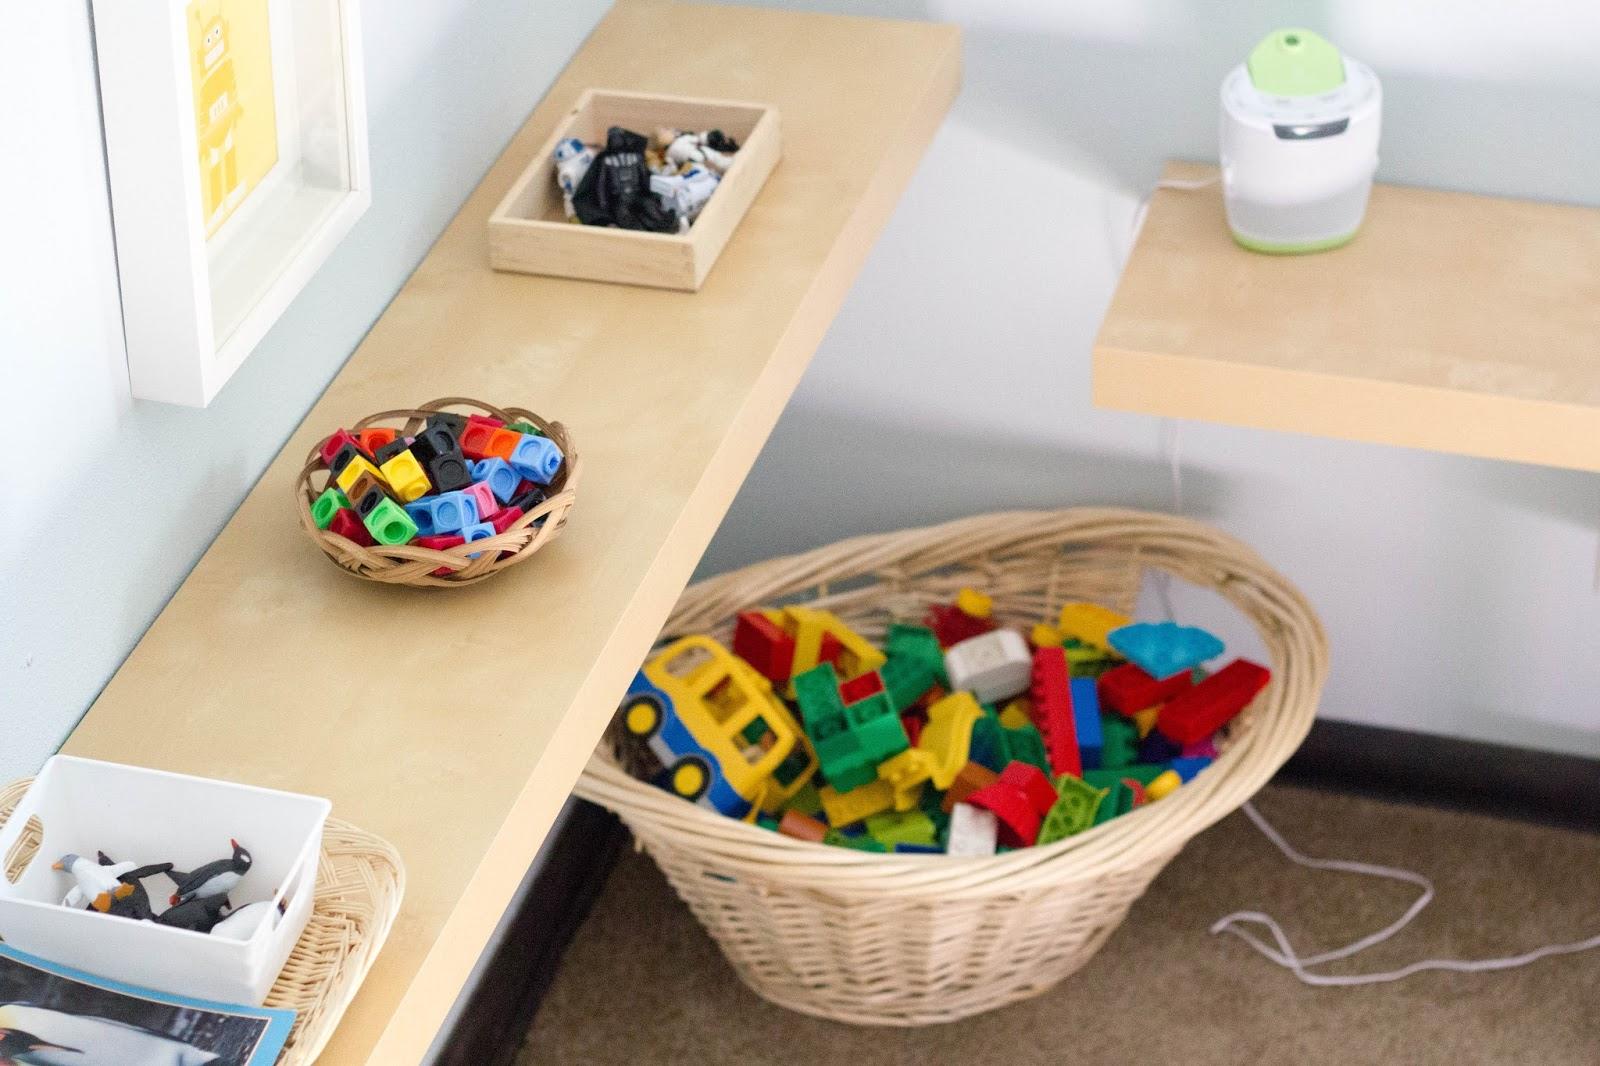 Montessori At 4 Years Old